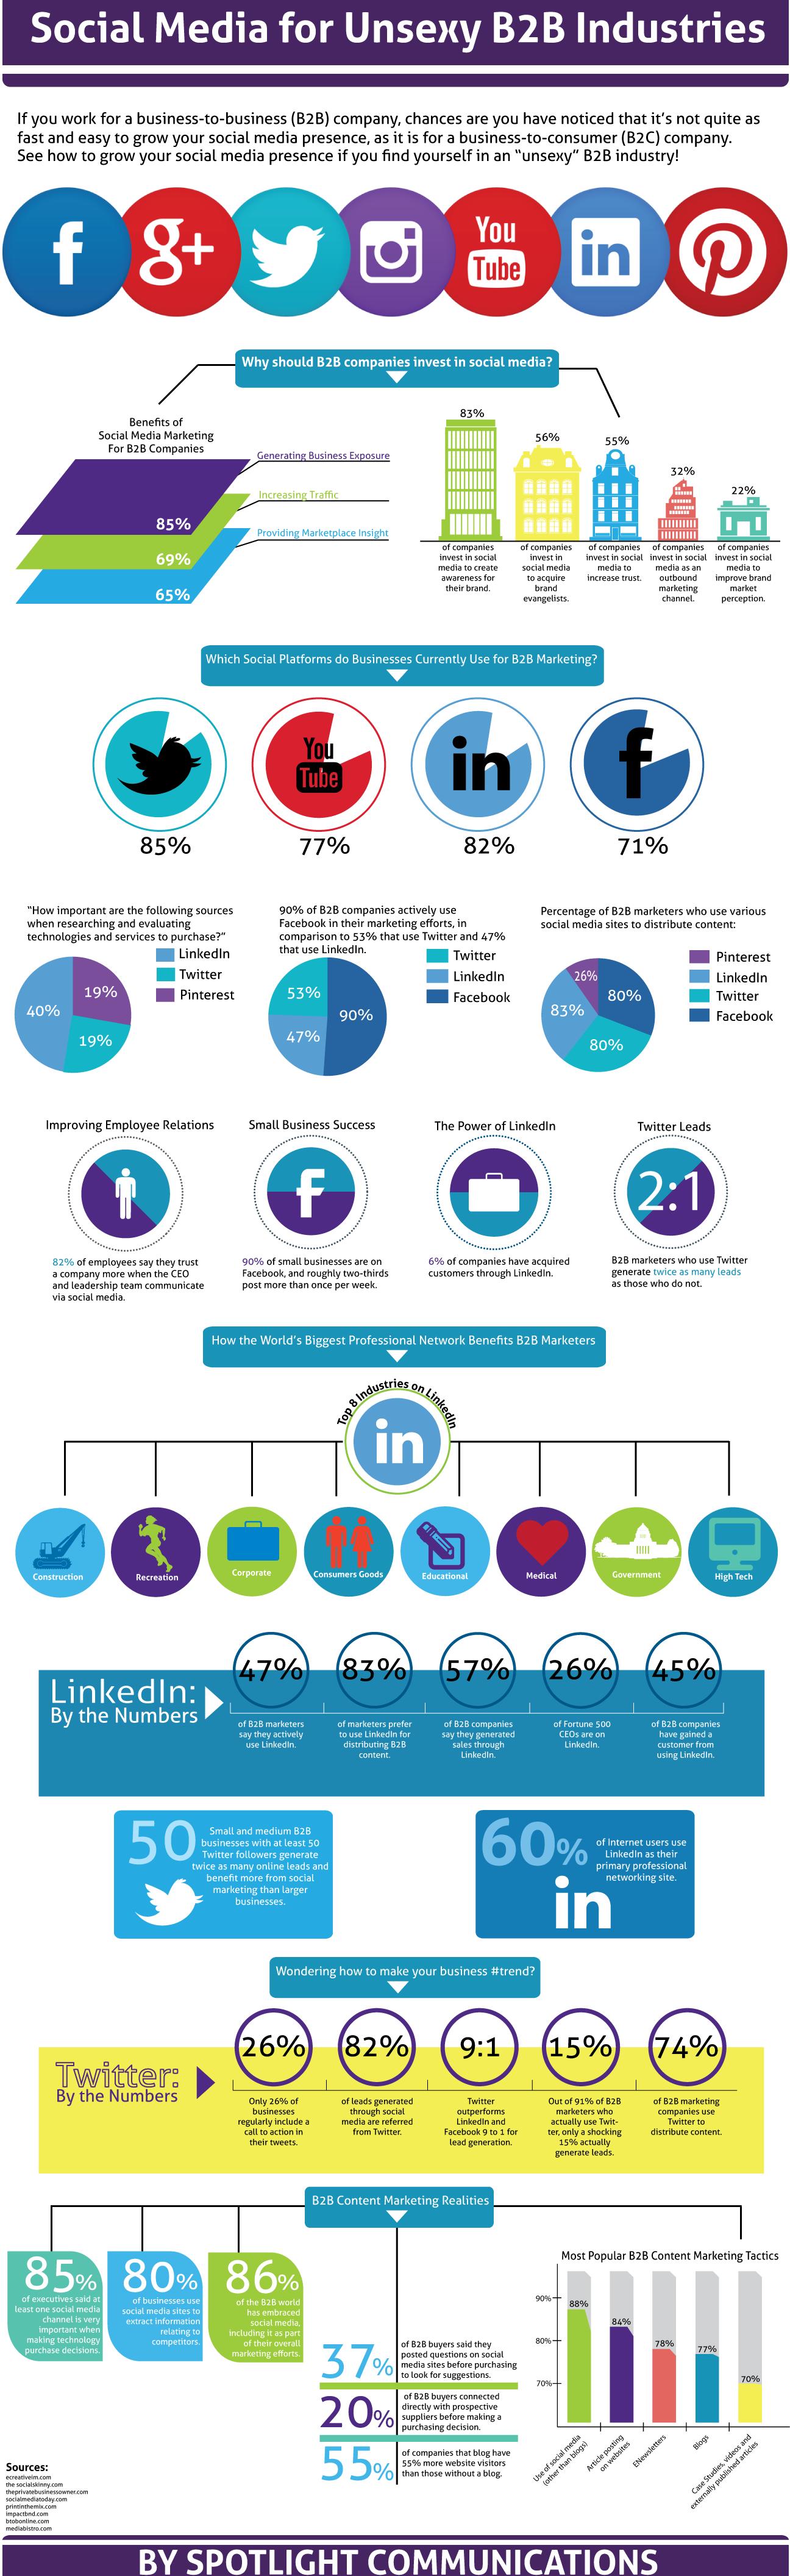 B2B Social Media in 2016